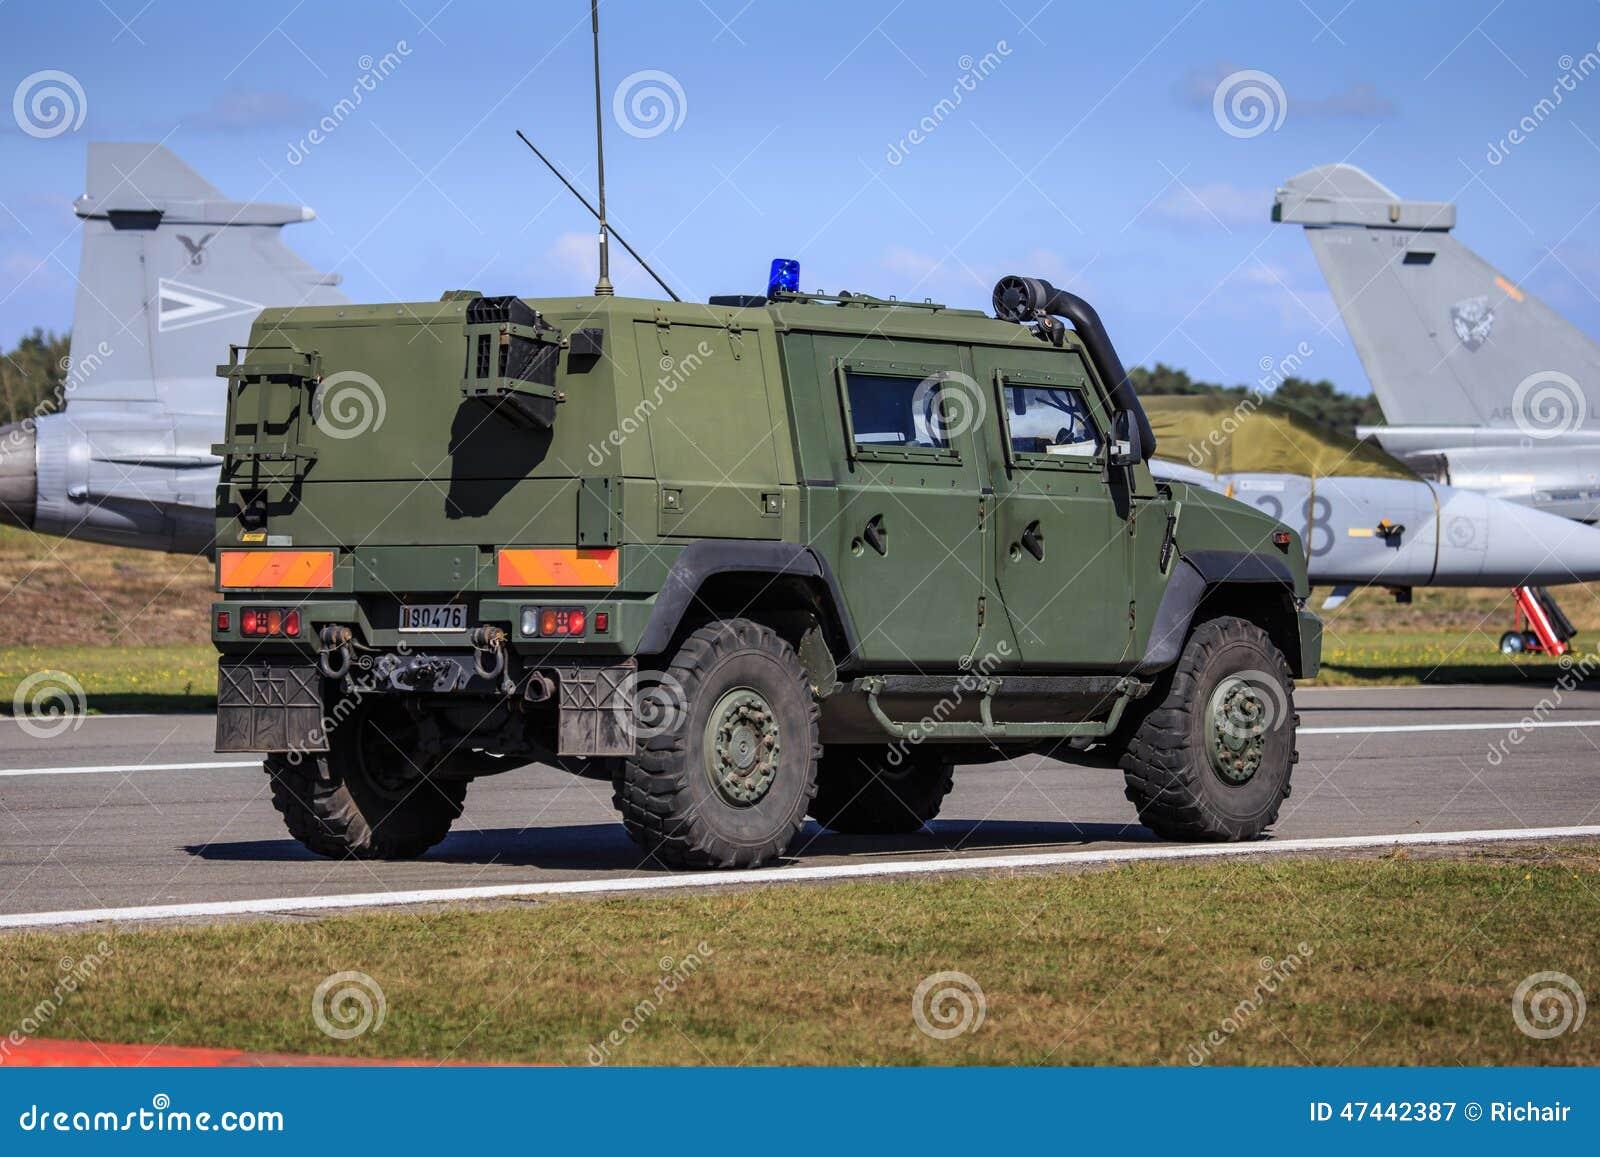 Army vehicle on patrol